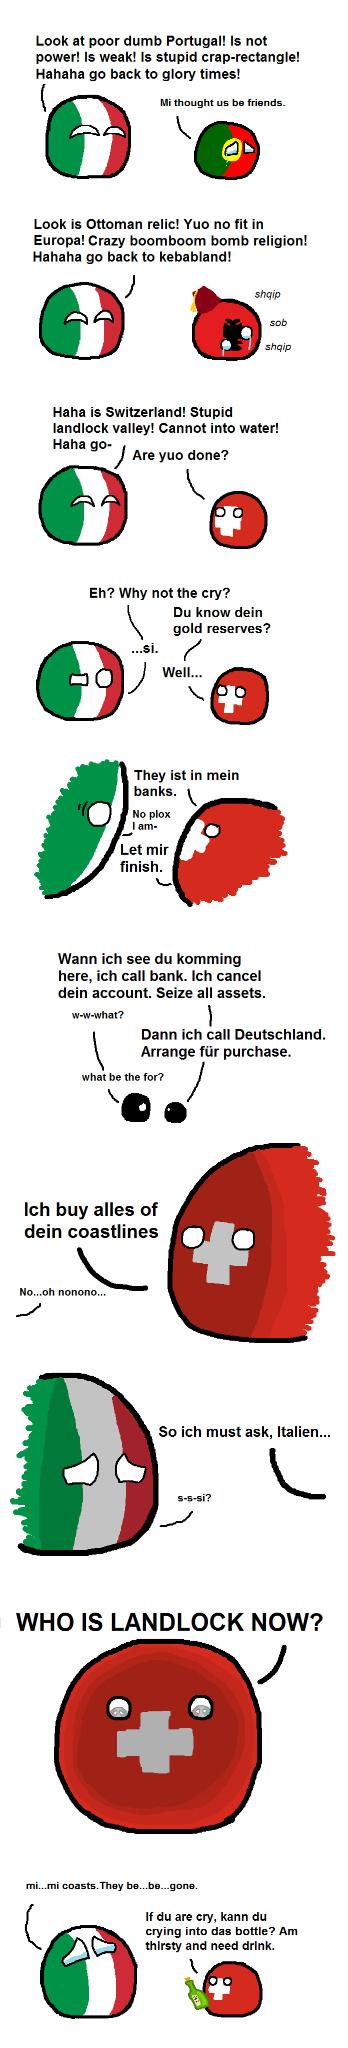 Swiss Bank - meme